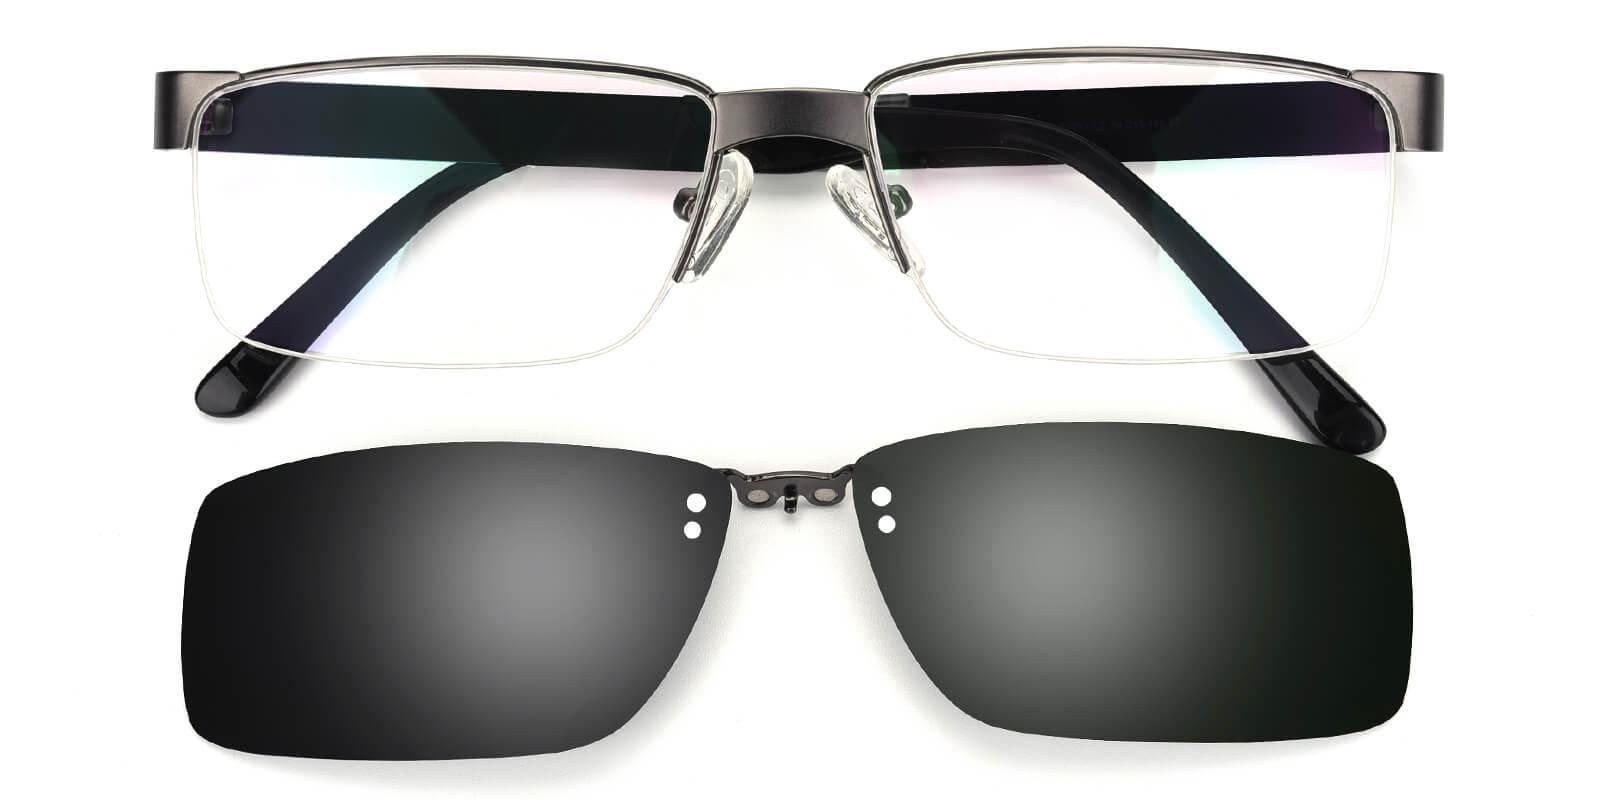 Sparkle-Gun-Rectangle-Metal-Eyeglasses-detail